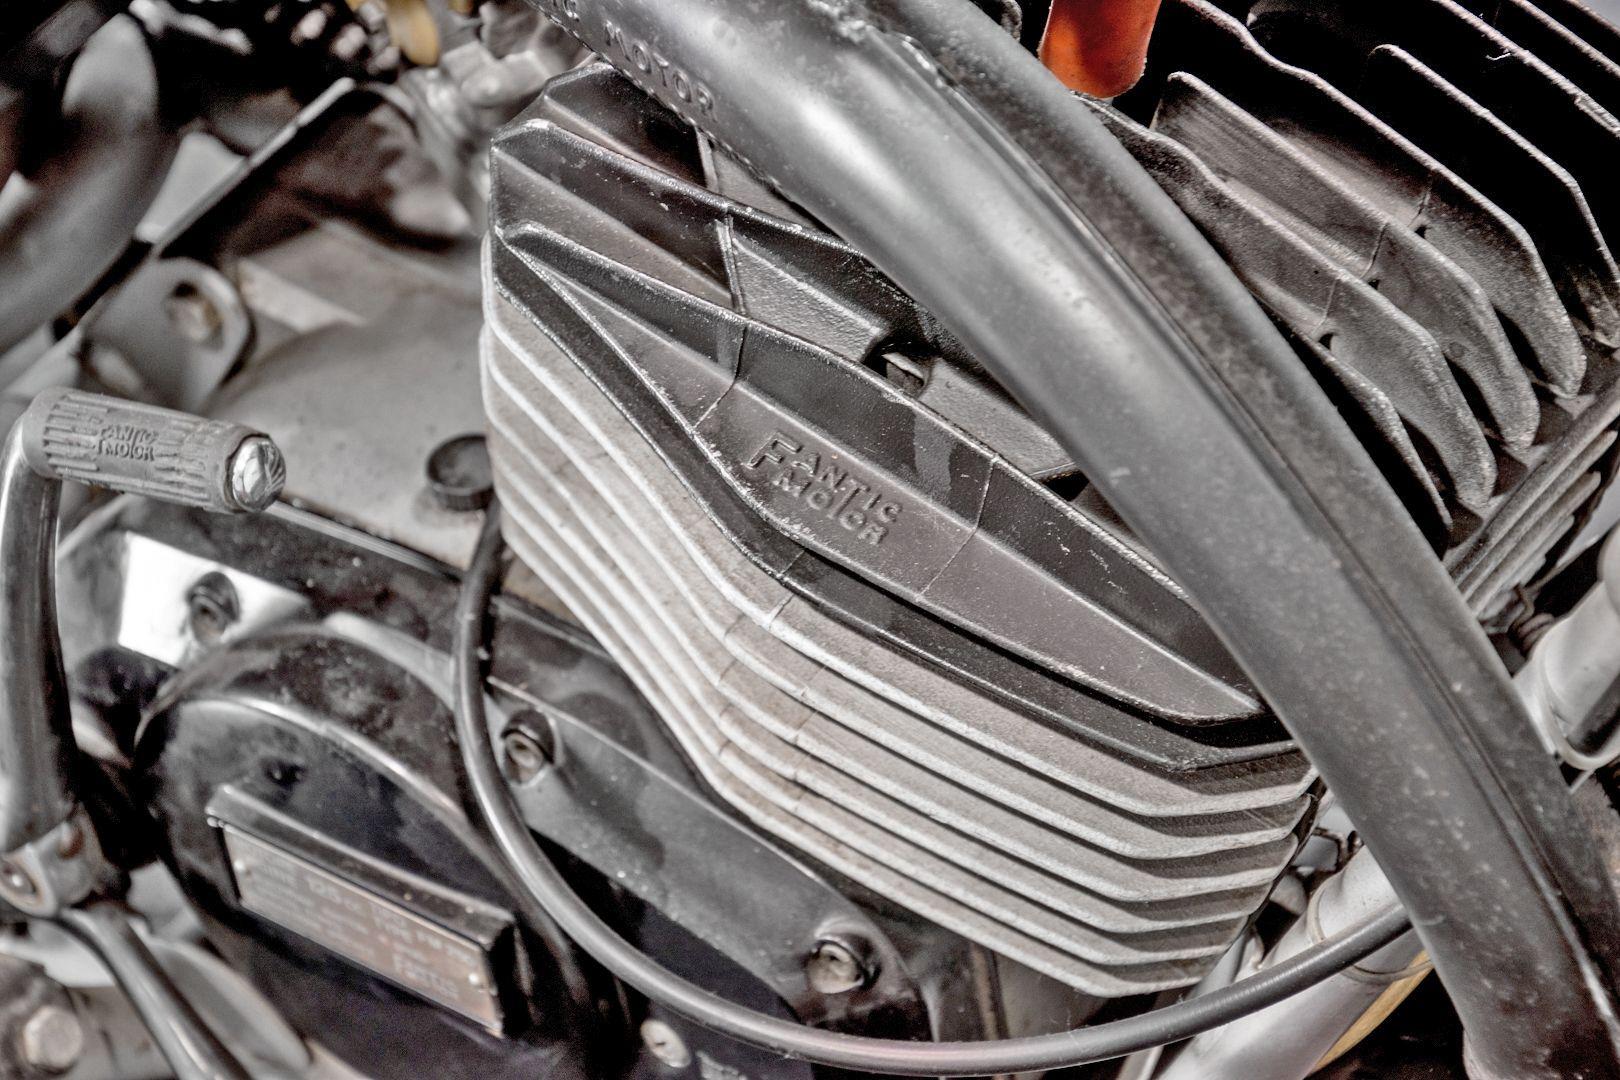 1980 Fantic Motor 125 74649